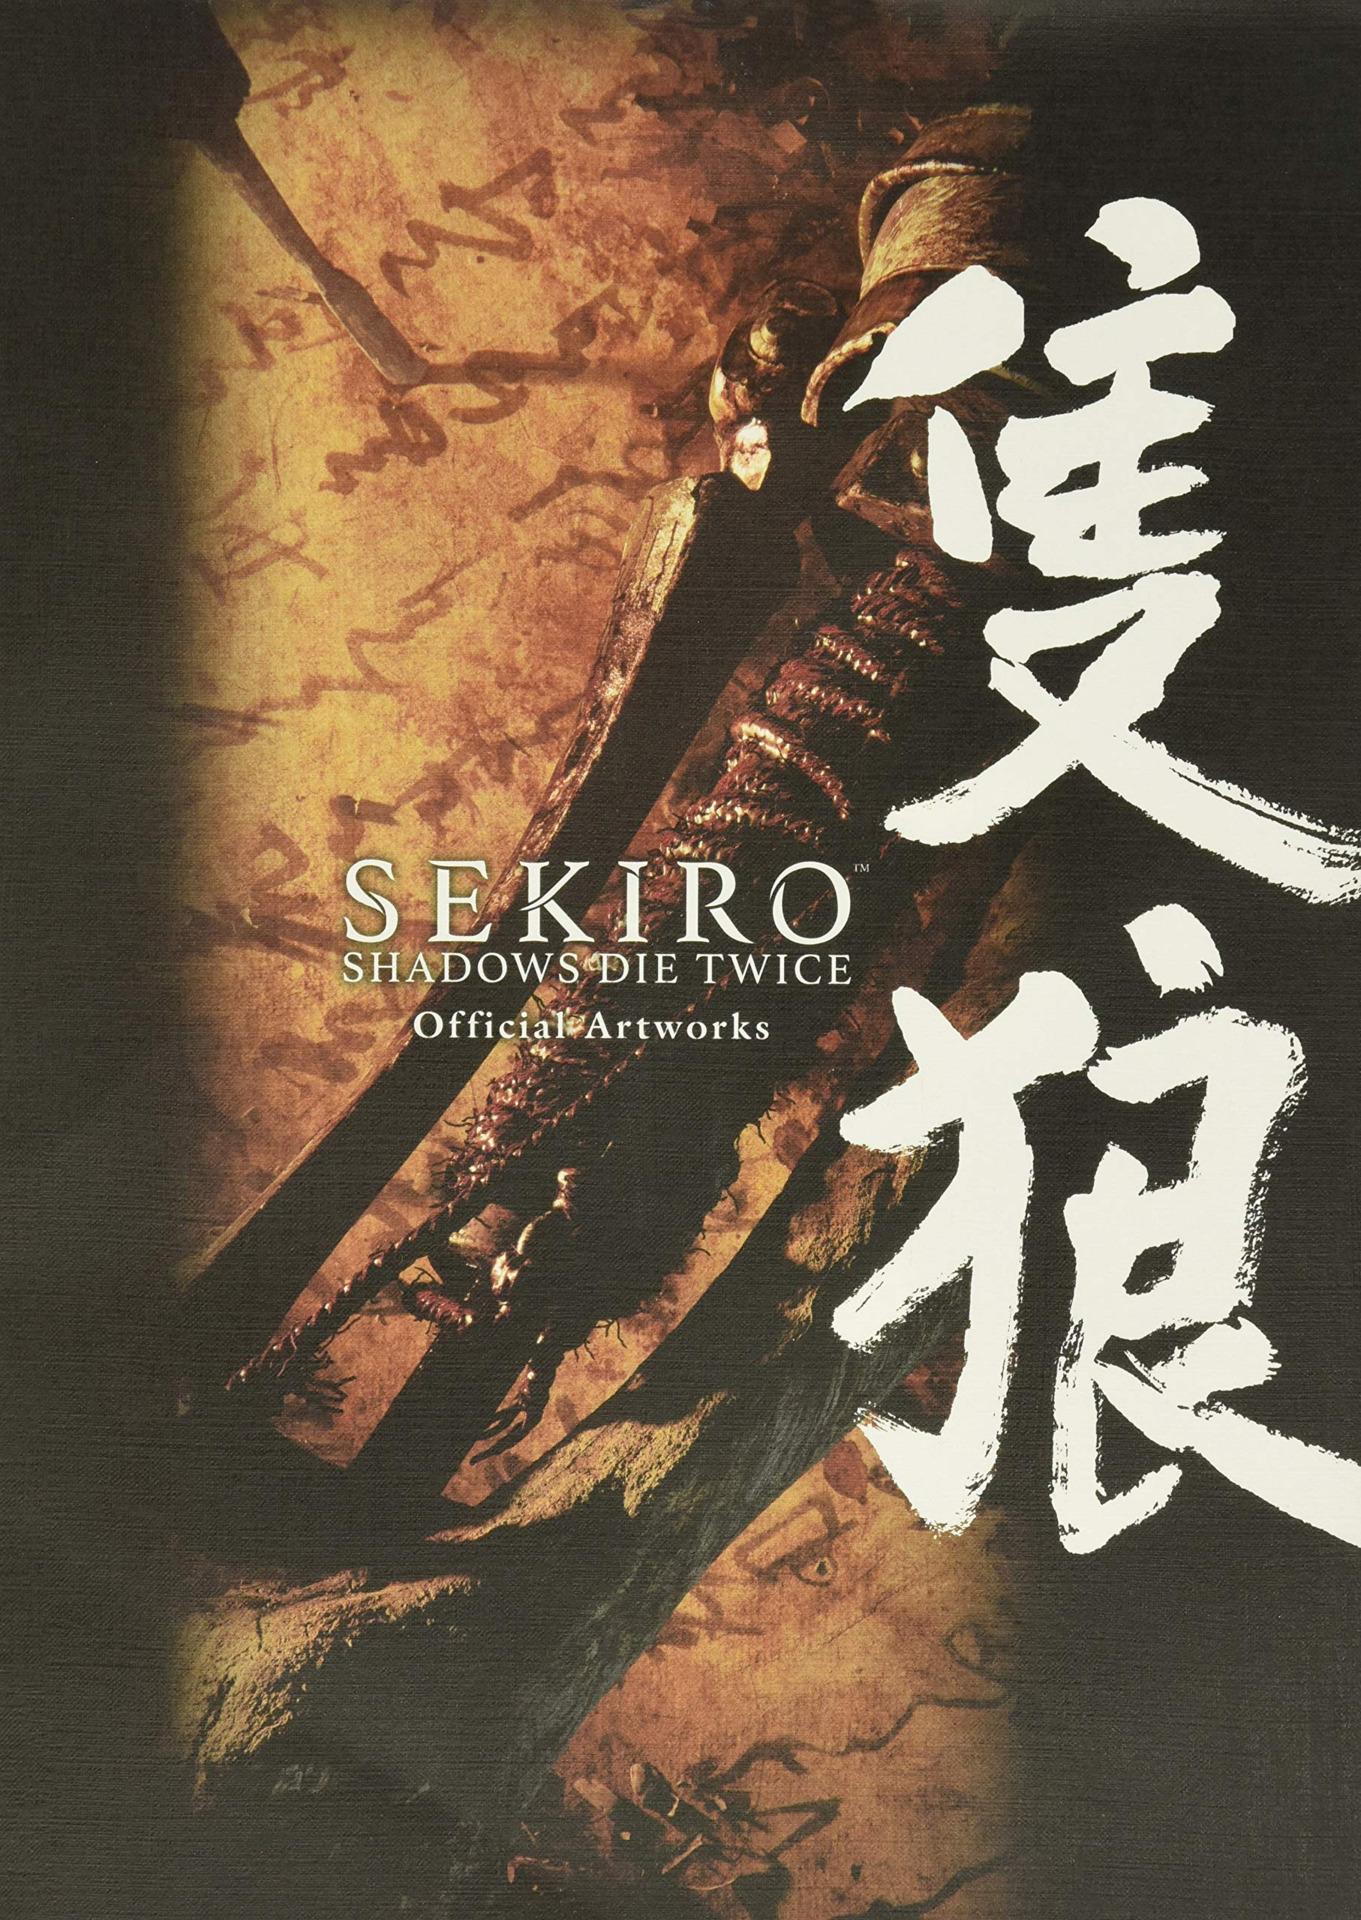 Kniha Sekiro: Shadows Die Twice Official Artworks